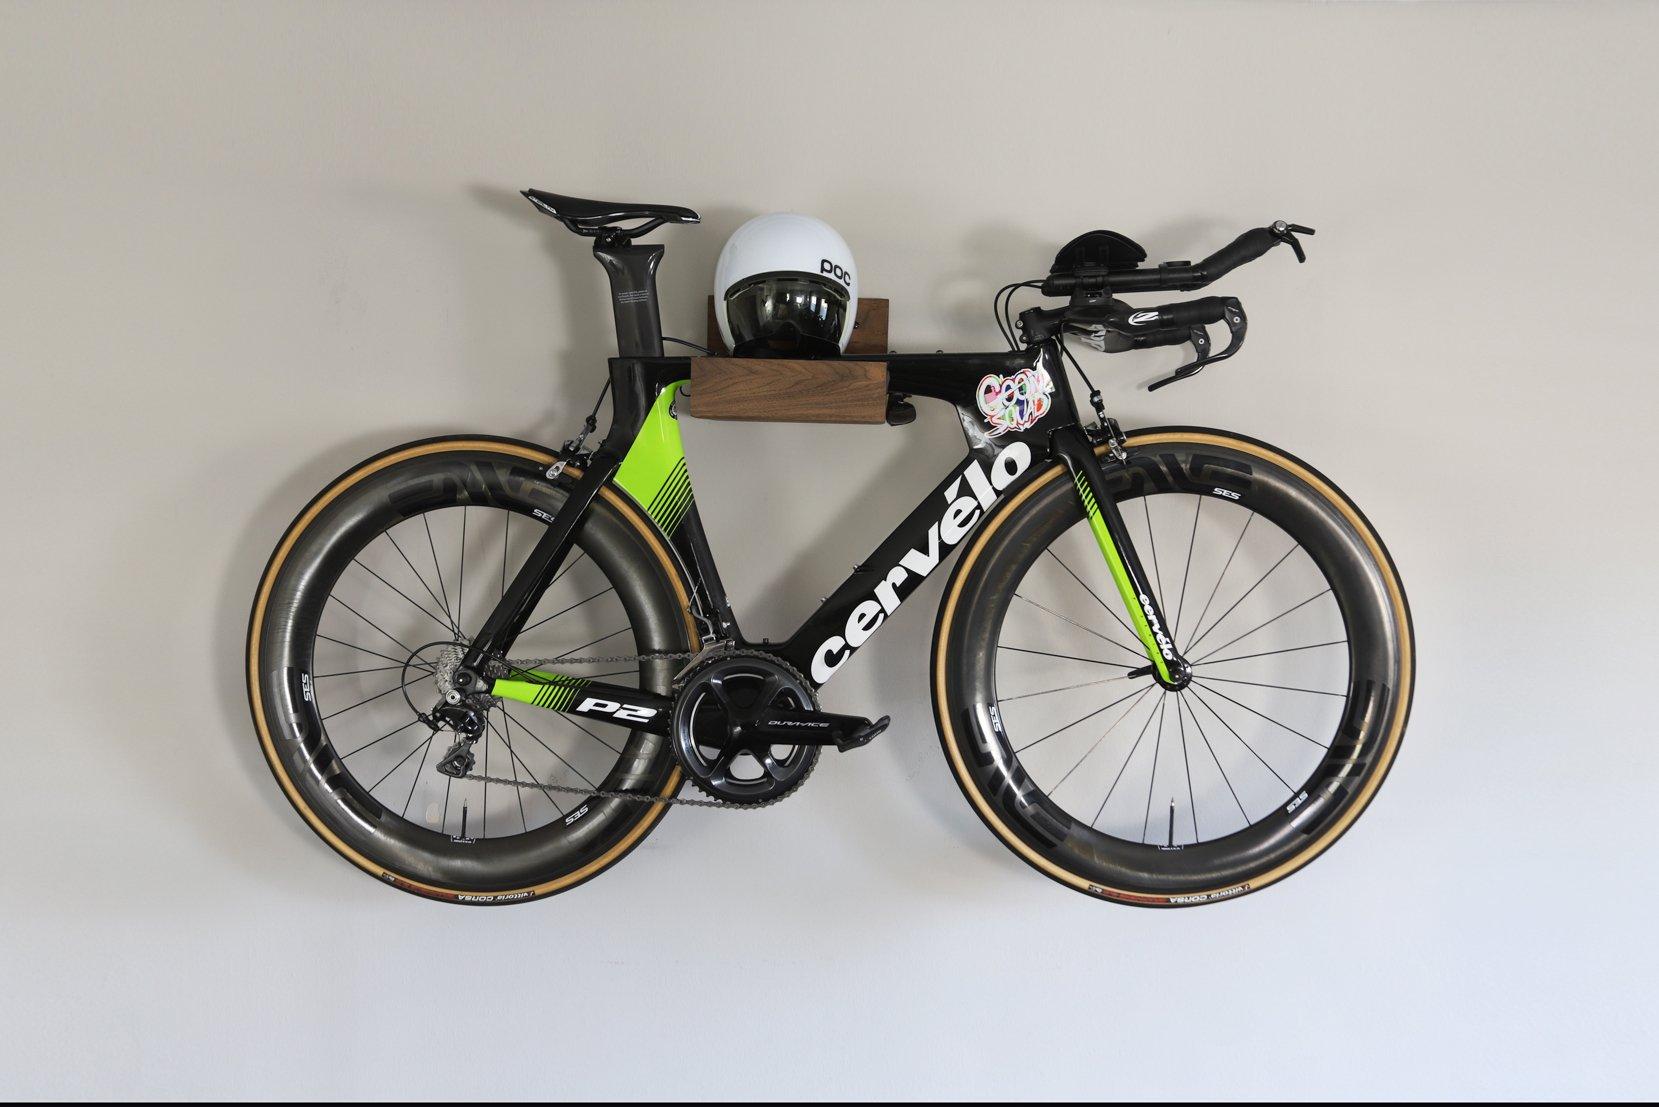 DIY Modern Wall Mounted Bike Rack